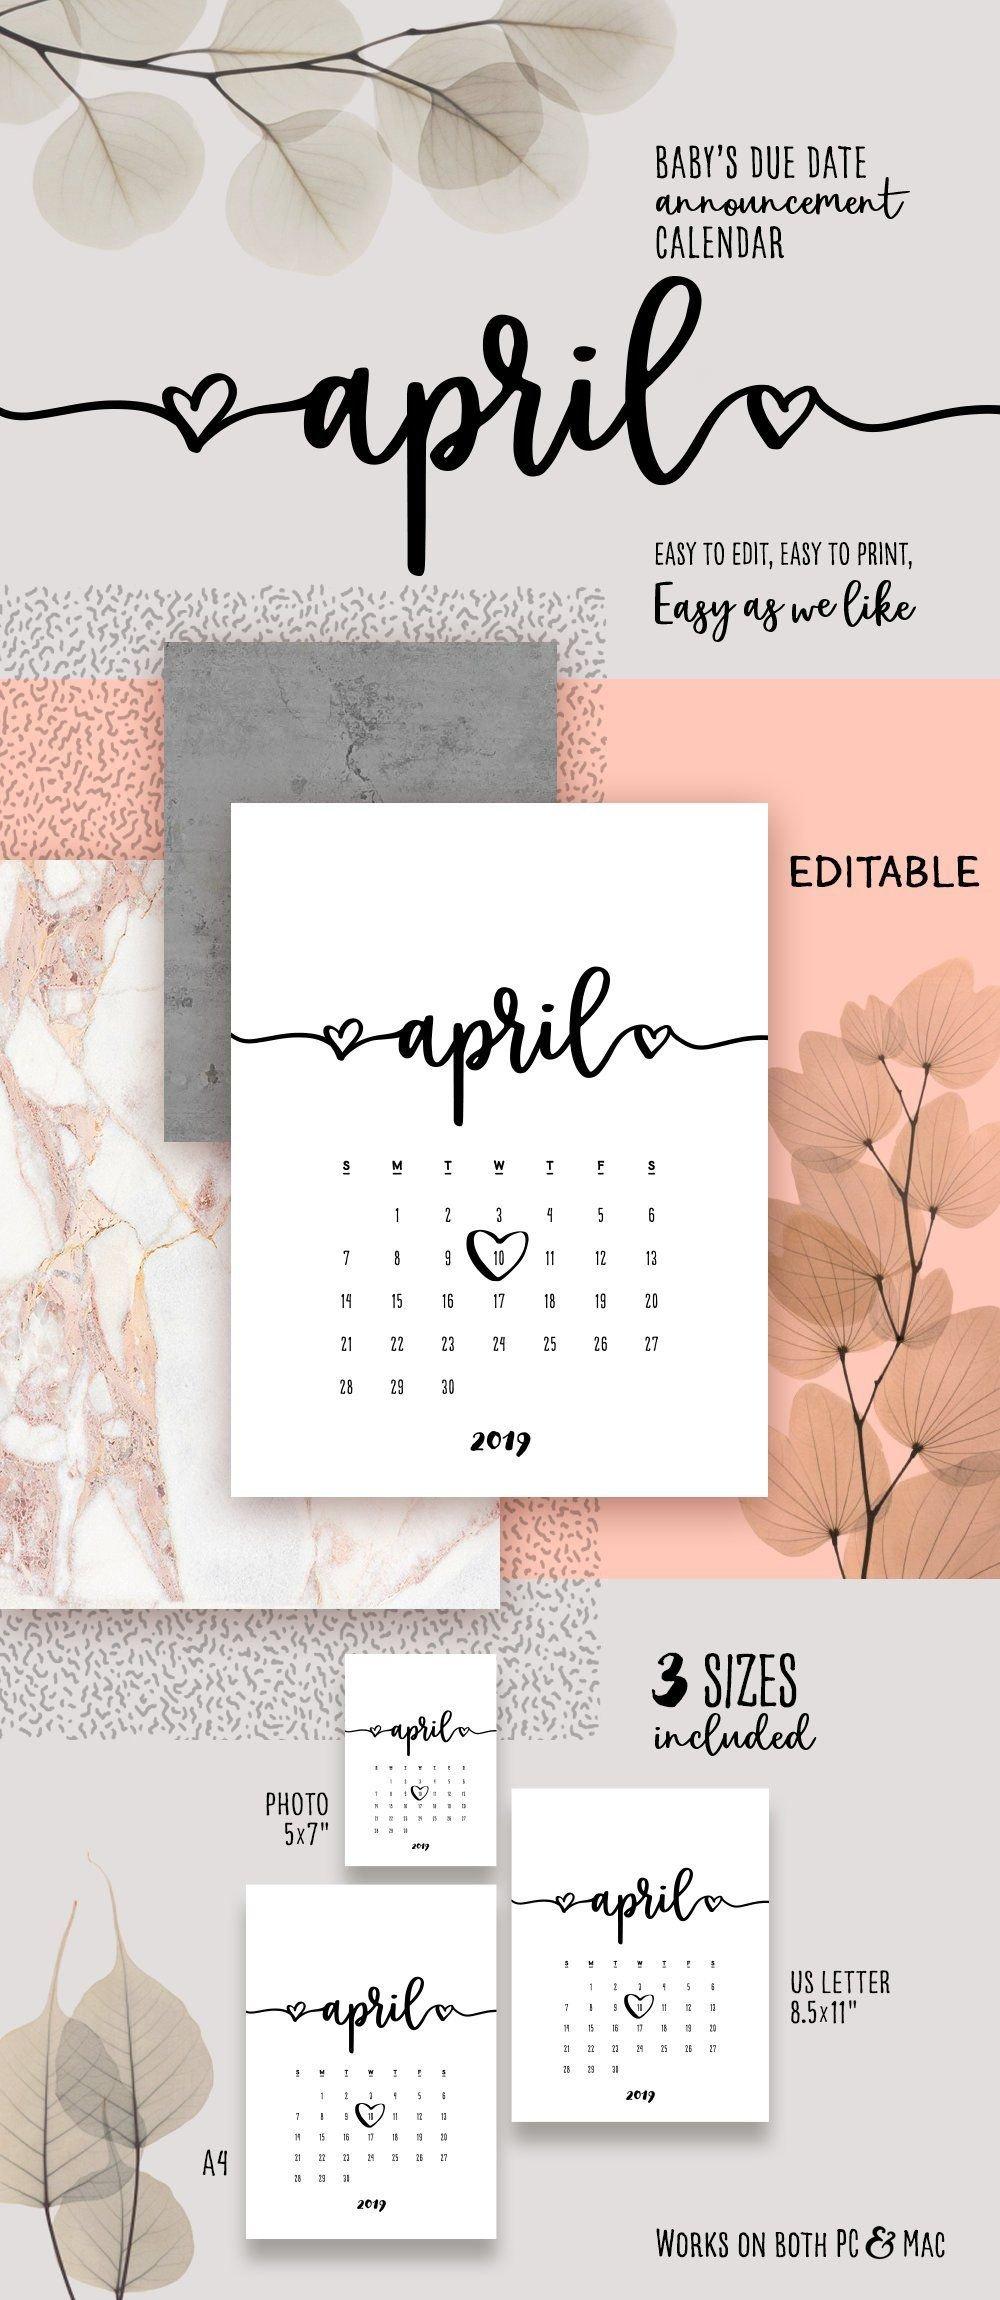 Pin On Pregnancy Announcement Calendar Free Baby Due Date Calendar